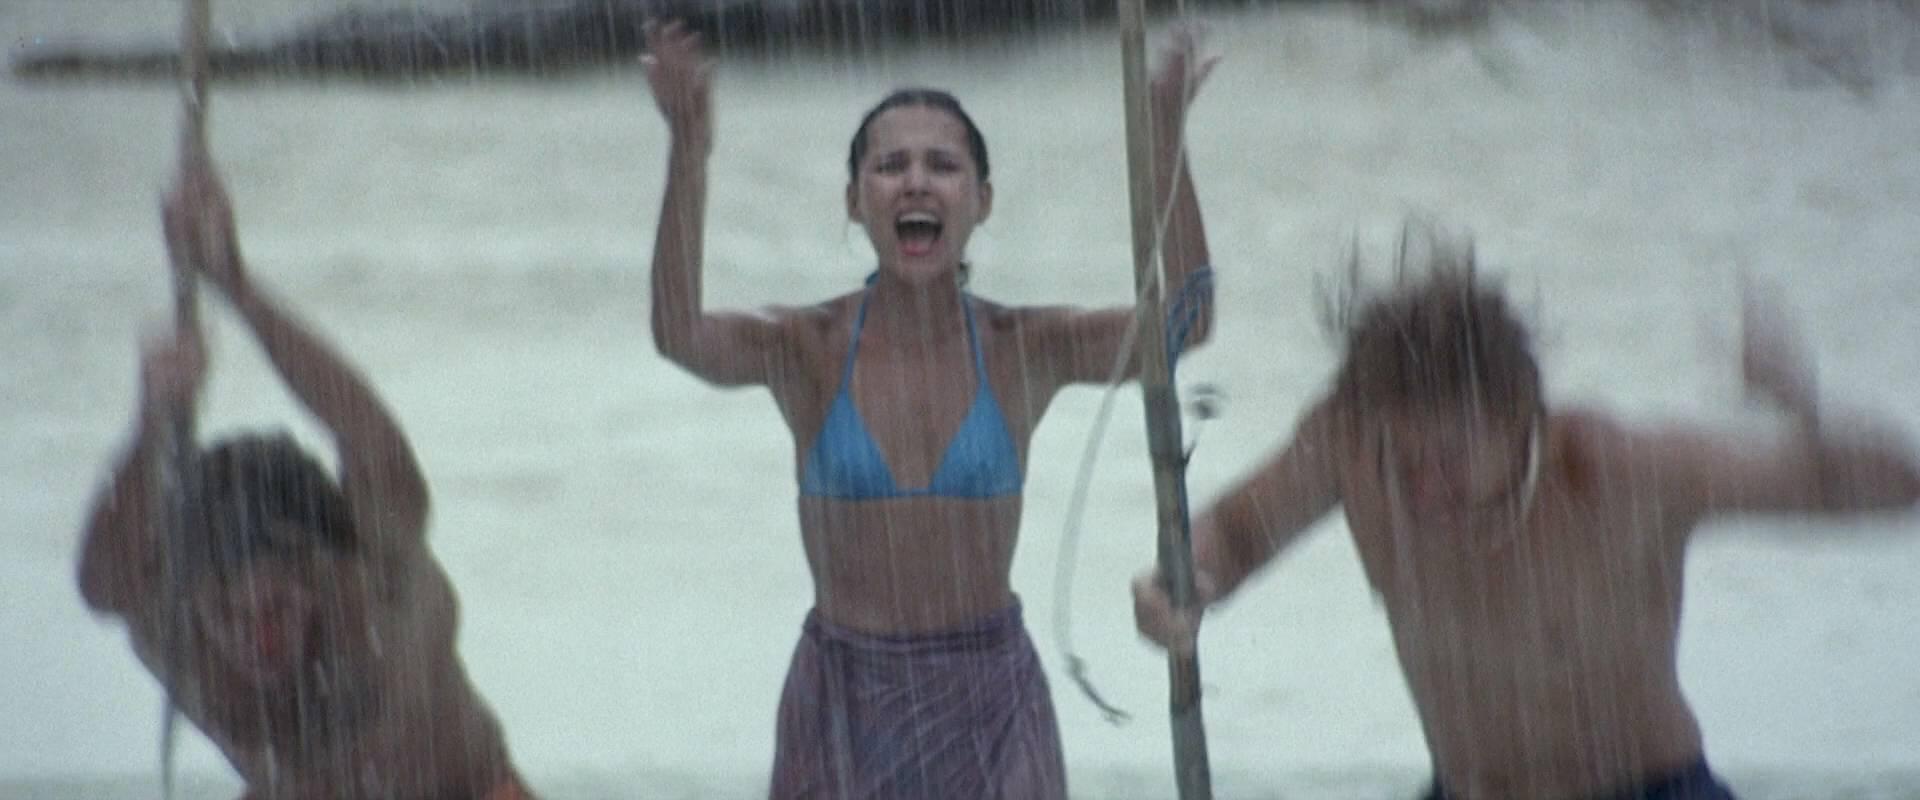 Virginie Ledoyen nude topless Tilda Swinton hot sex - The Beach (2000) HD 1080p BluRay (6)